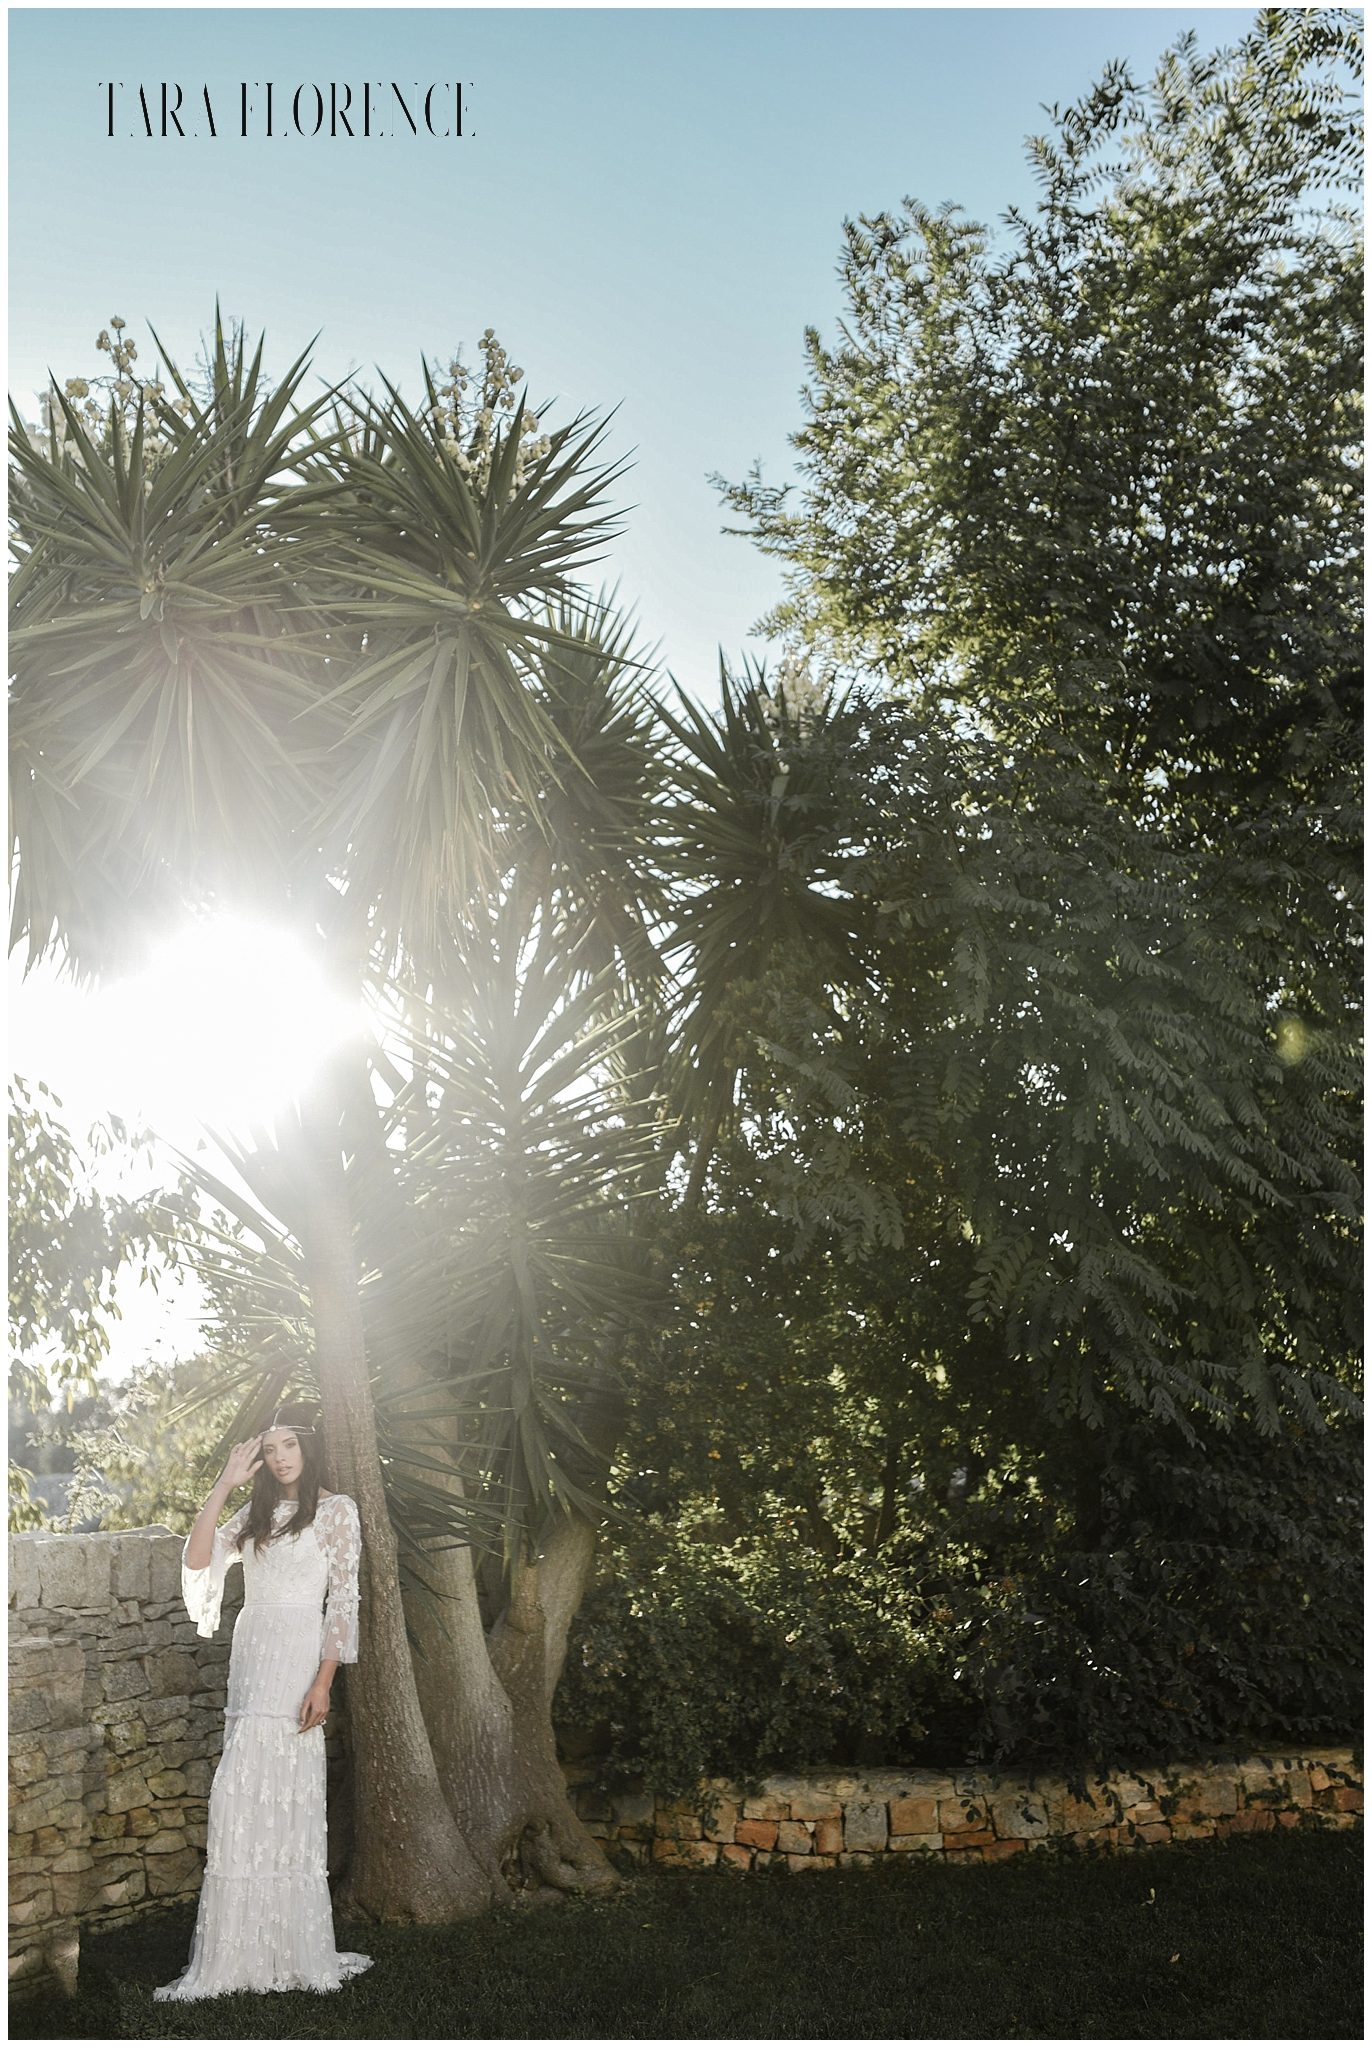 Puglia-Tara-Florence-Bridal-Editorial-153_WEB.jpg